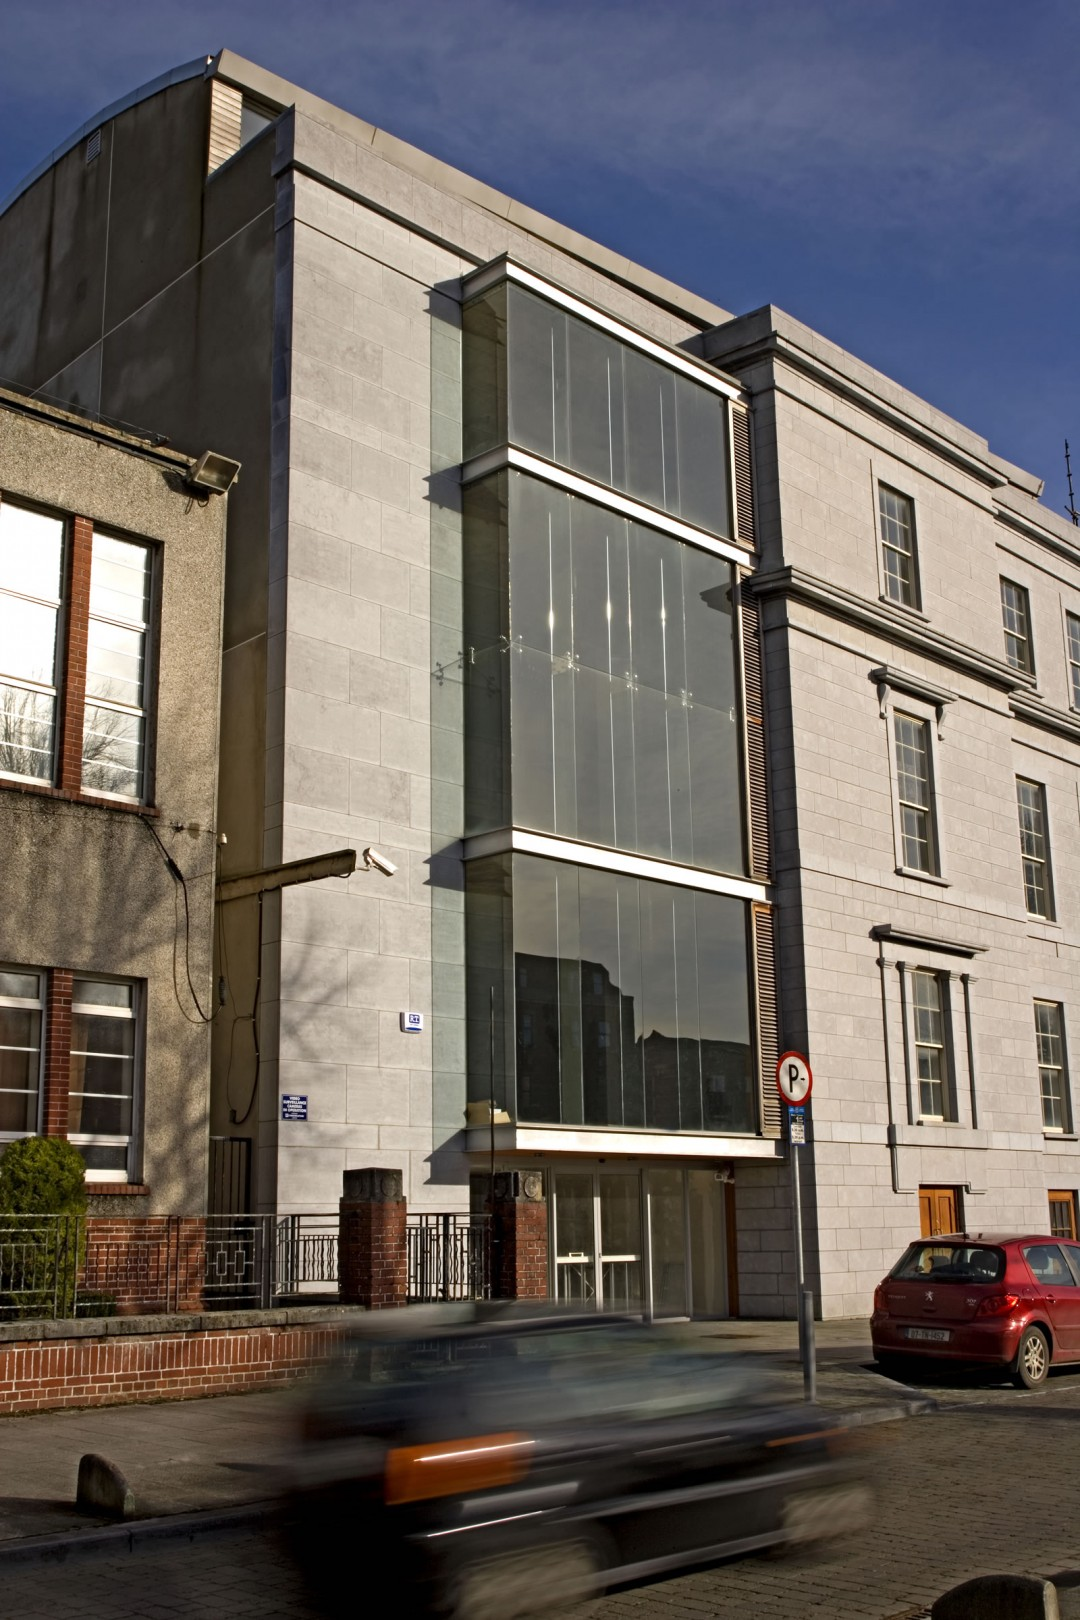 Barringtons Hospital Limerick